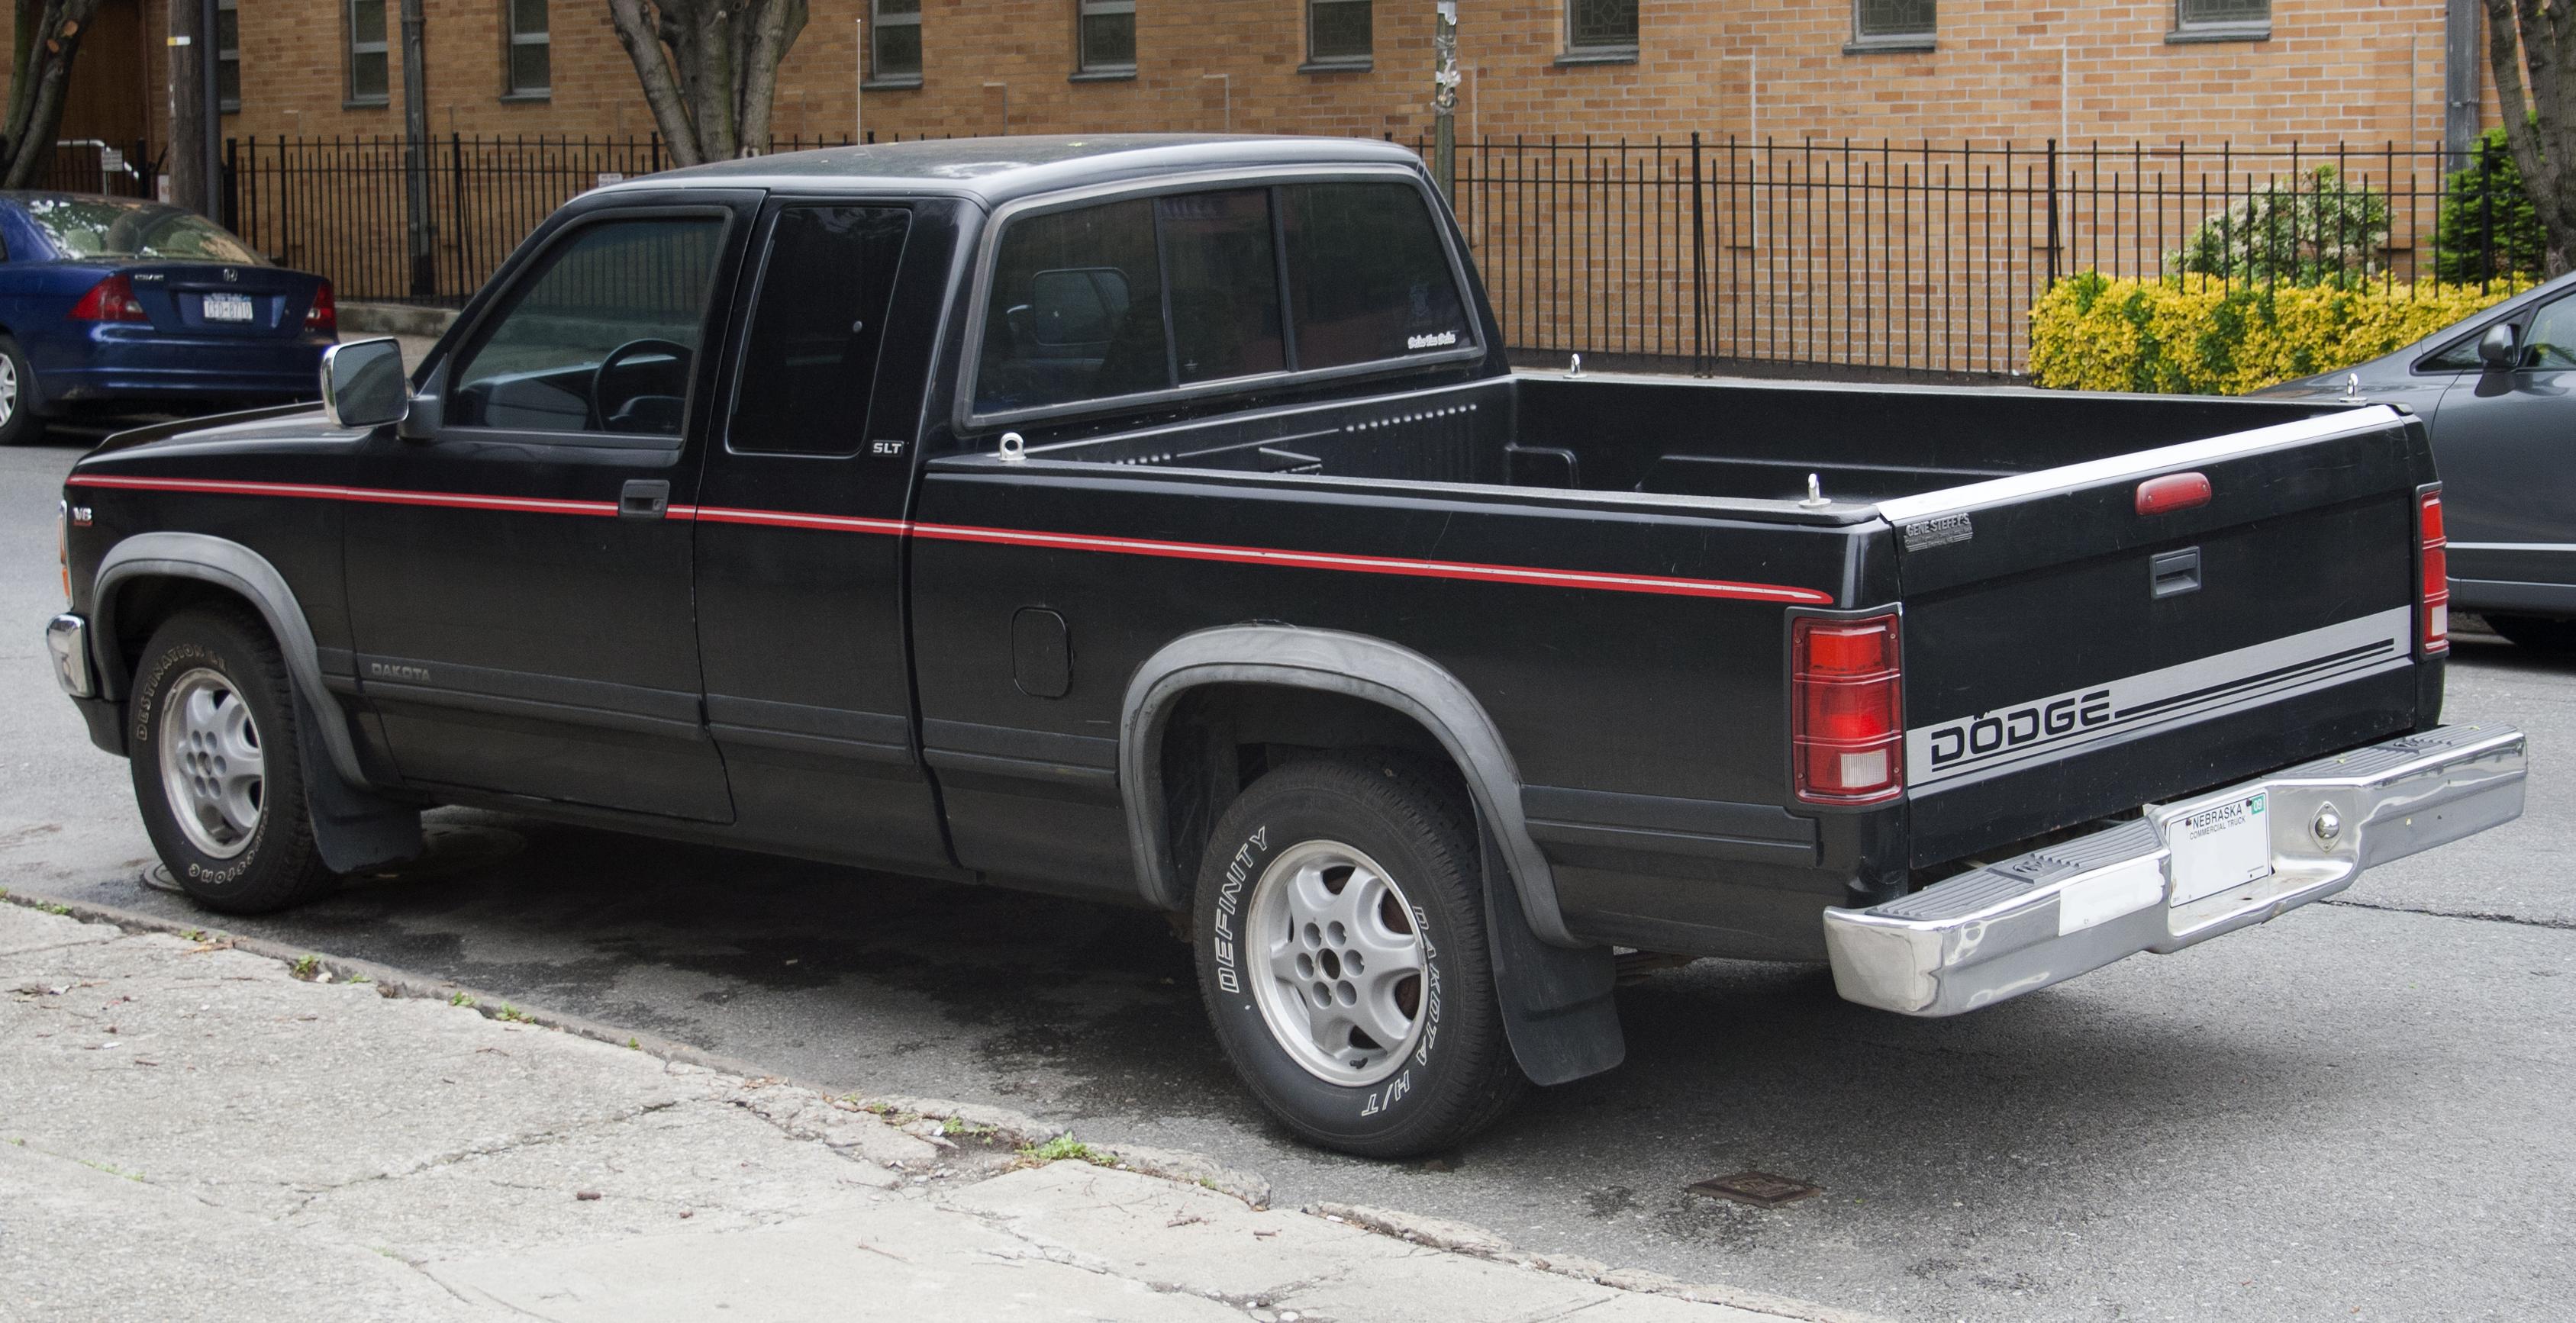 File:Dodge Dakota V8 SLT extcab.jpg - Wikimedia Commons